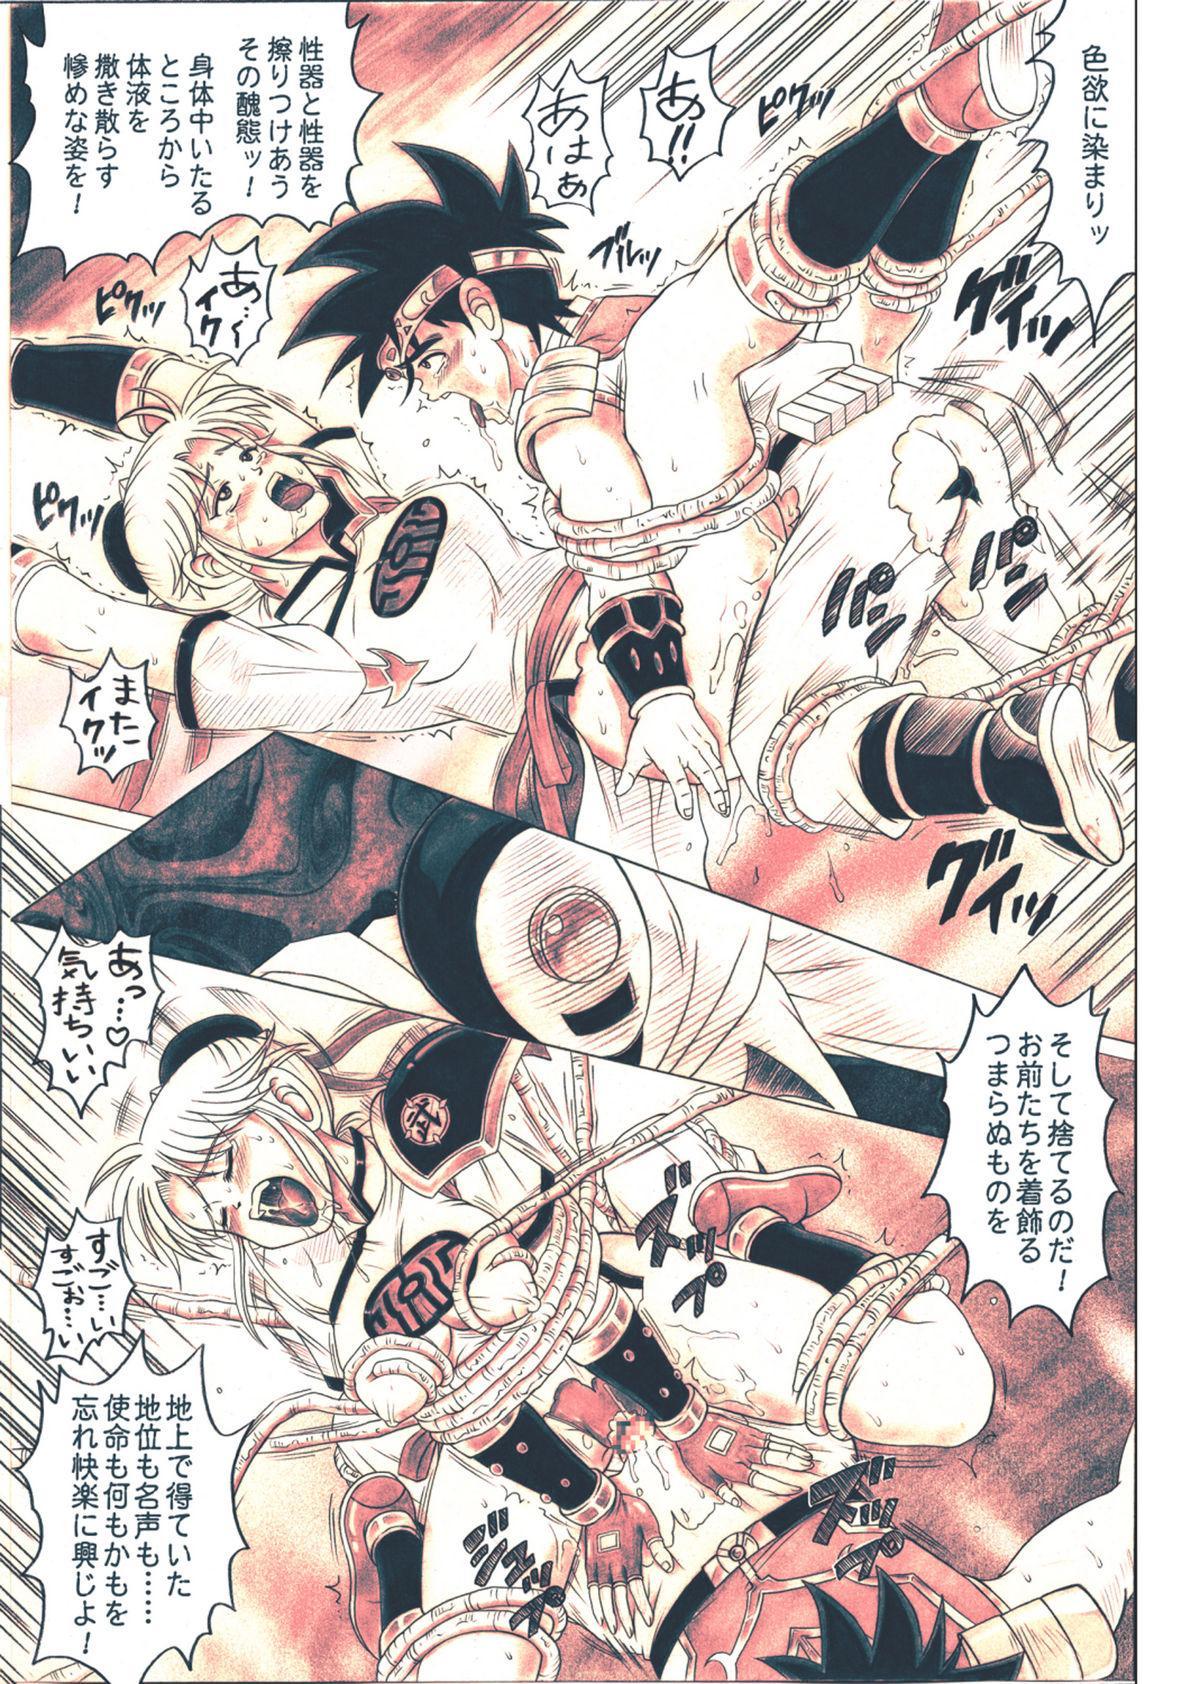 [Cyclone (Reizei, Izumi)] STAR TAC IDO ~Youkuso Haja no Doukutsu he~ Chuuhen Download edition (Dragon Warrior: Dai's Great Adventure) [Digital] 106